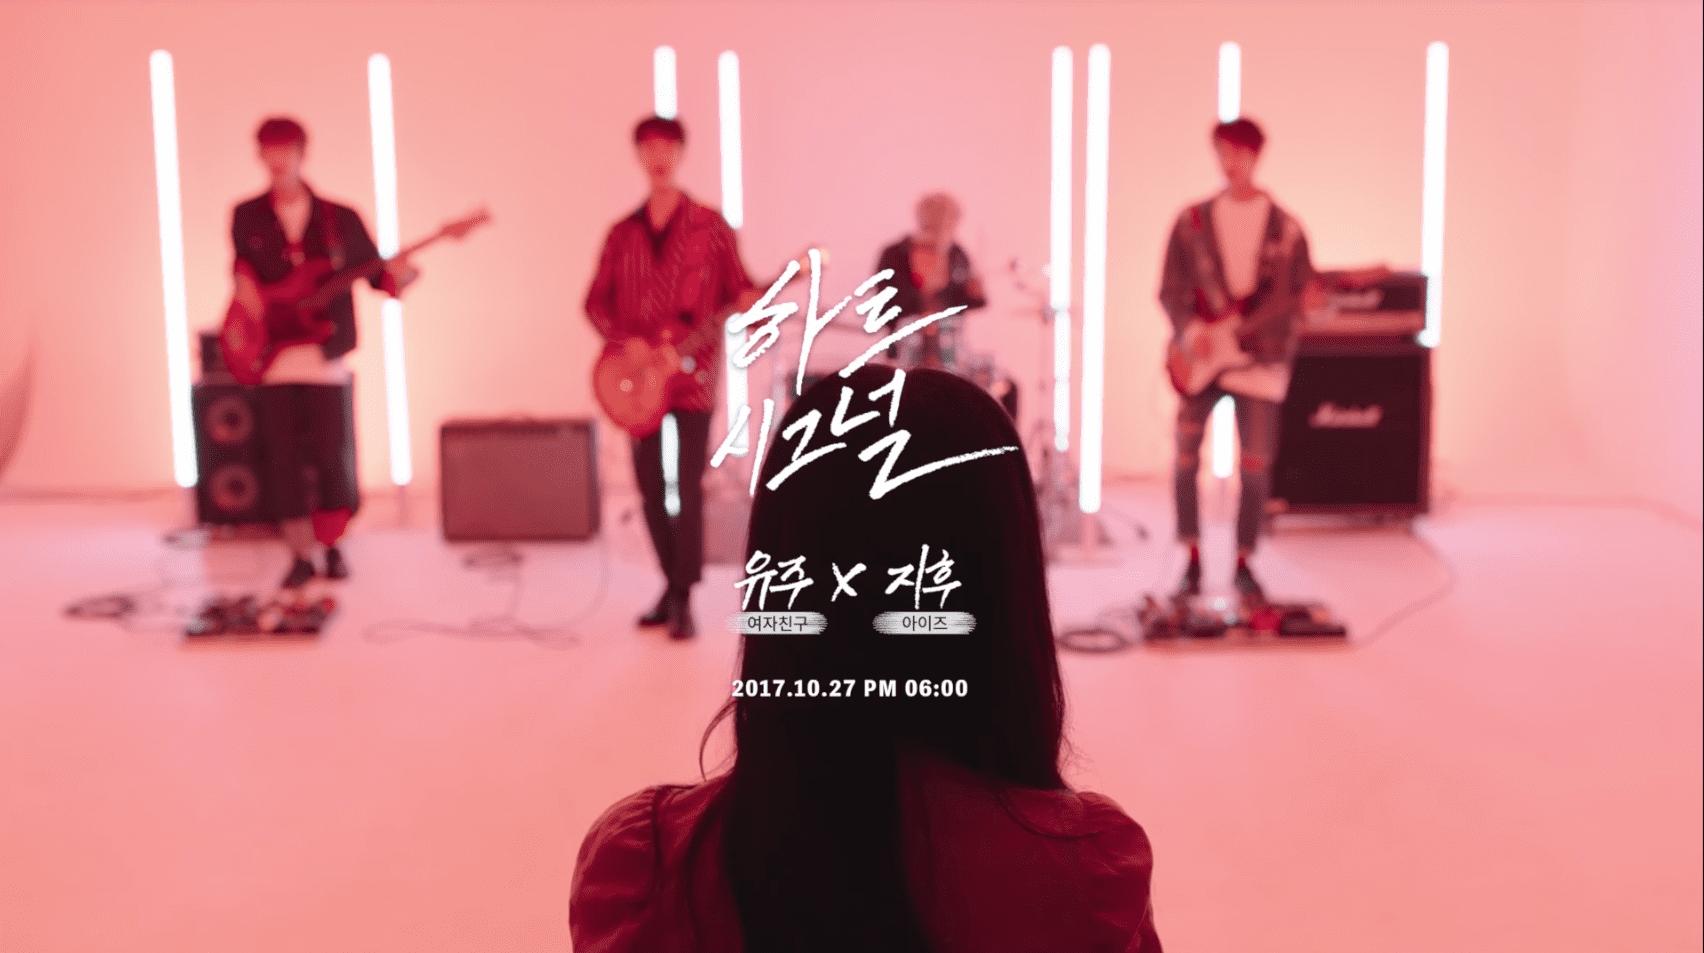 Watch: GFRIEND's Yuju And IZ's Jihoo Release MV Teaser For Upcoming Duet